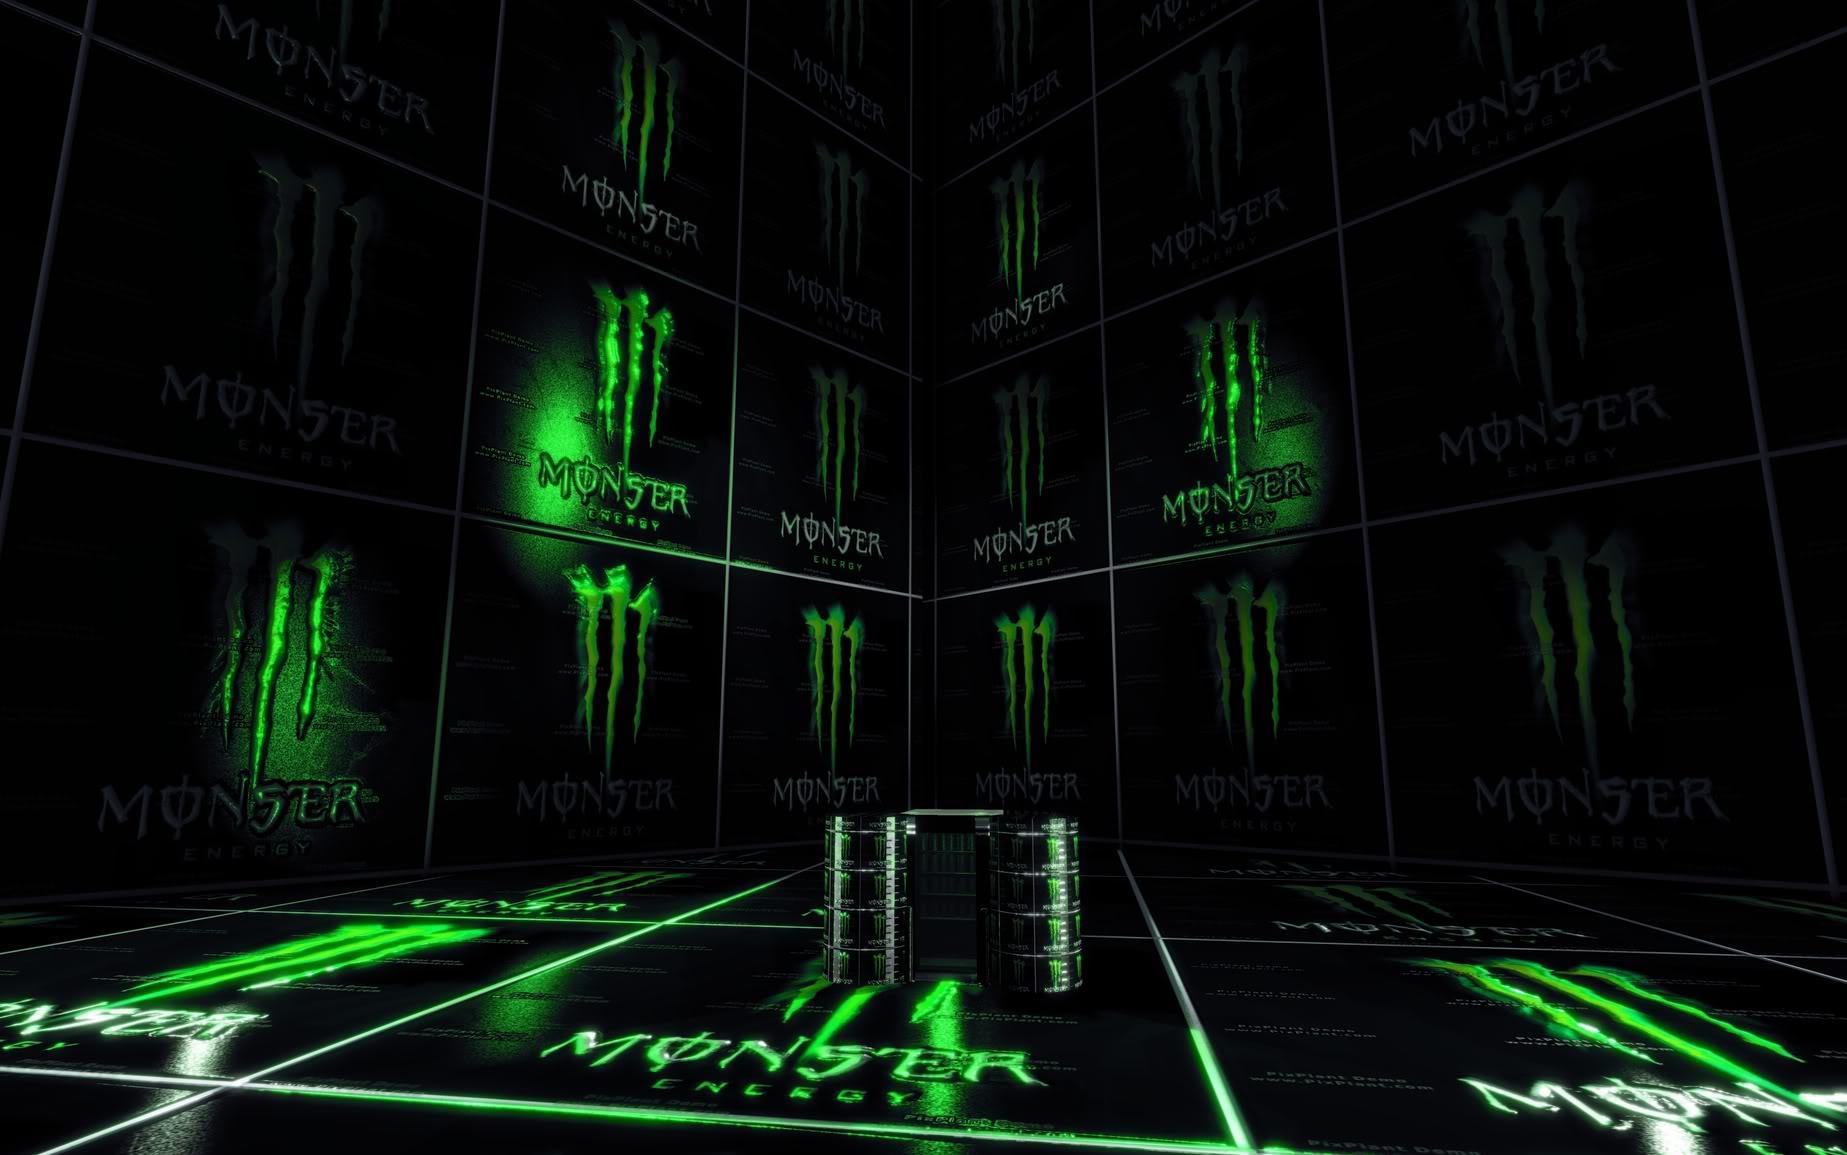 Monster logo wallpaper wallpapersafari monster energy logo wallpaper monster energy logo wallpaper voltagebd Choice Image